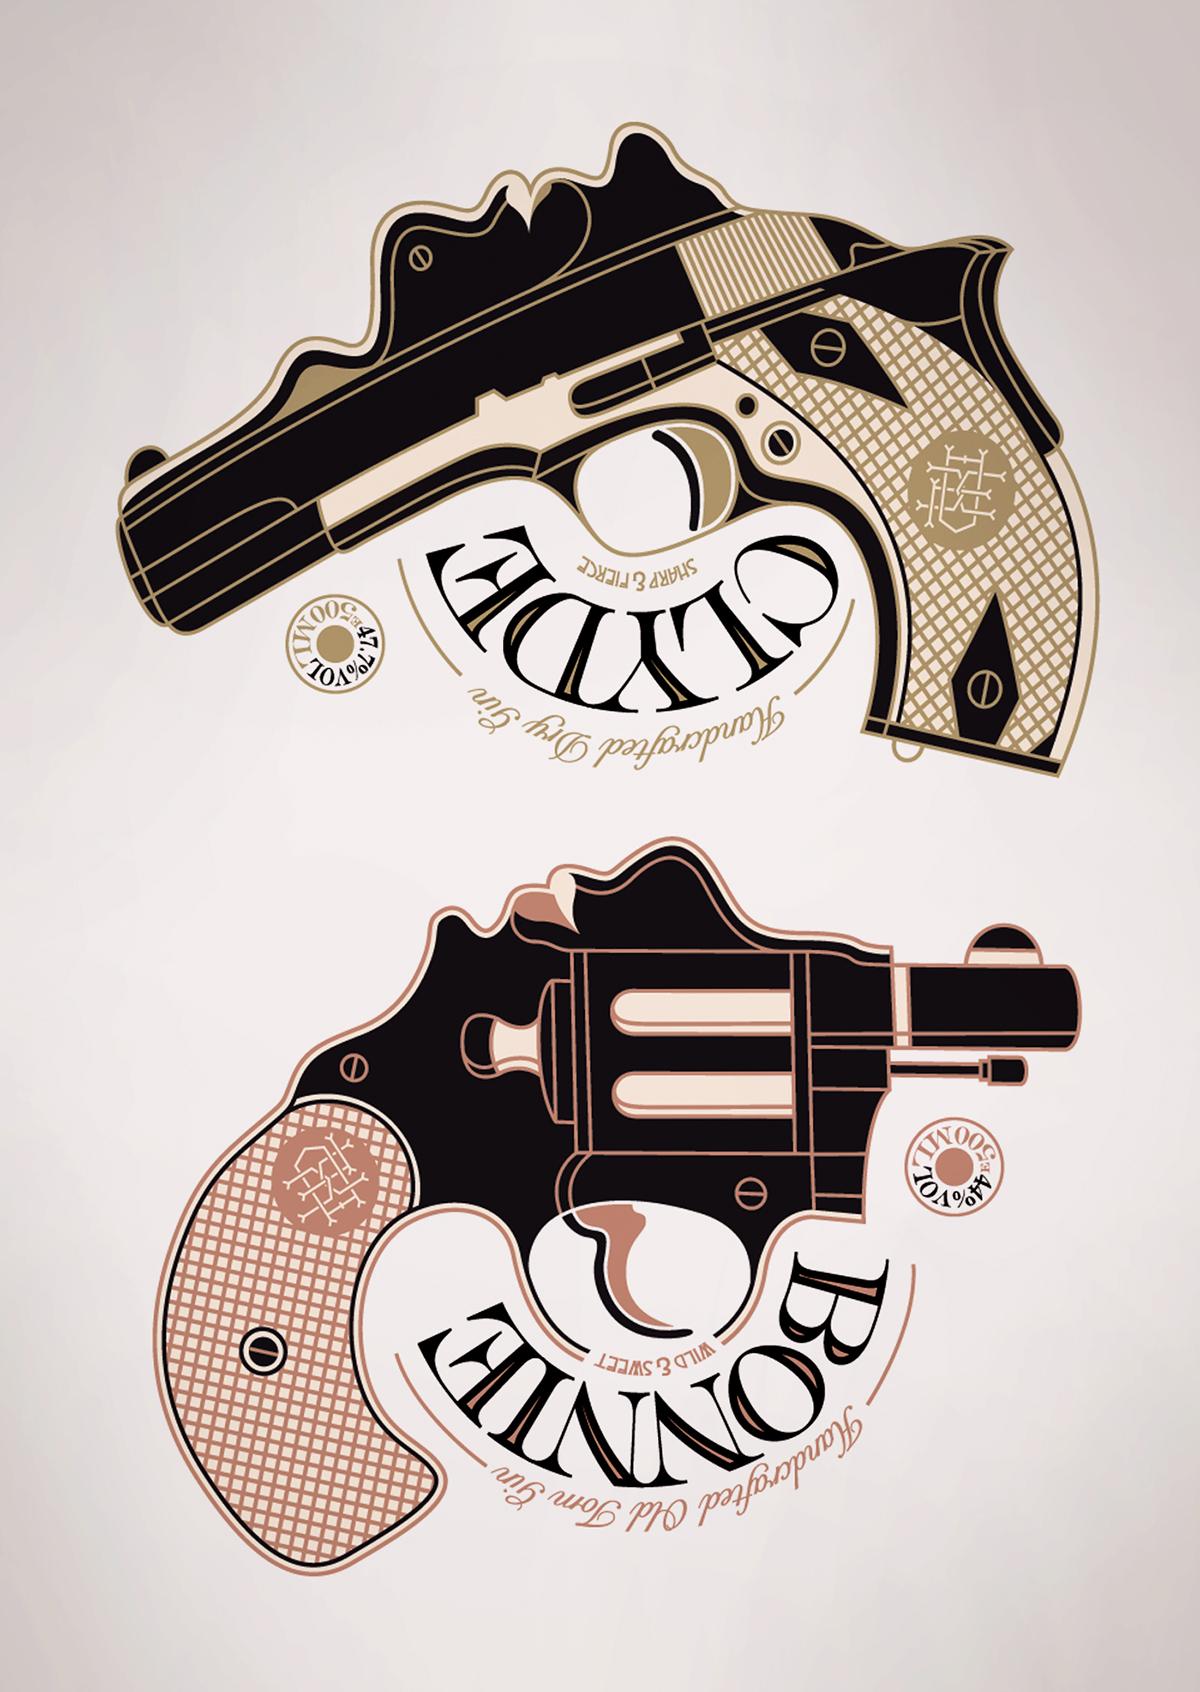 Bonnie And Clyde Tattoo: Bonnie & Clyde Gin On Behance